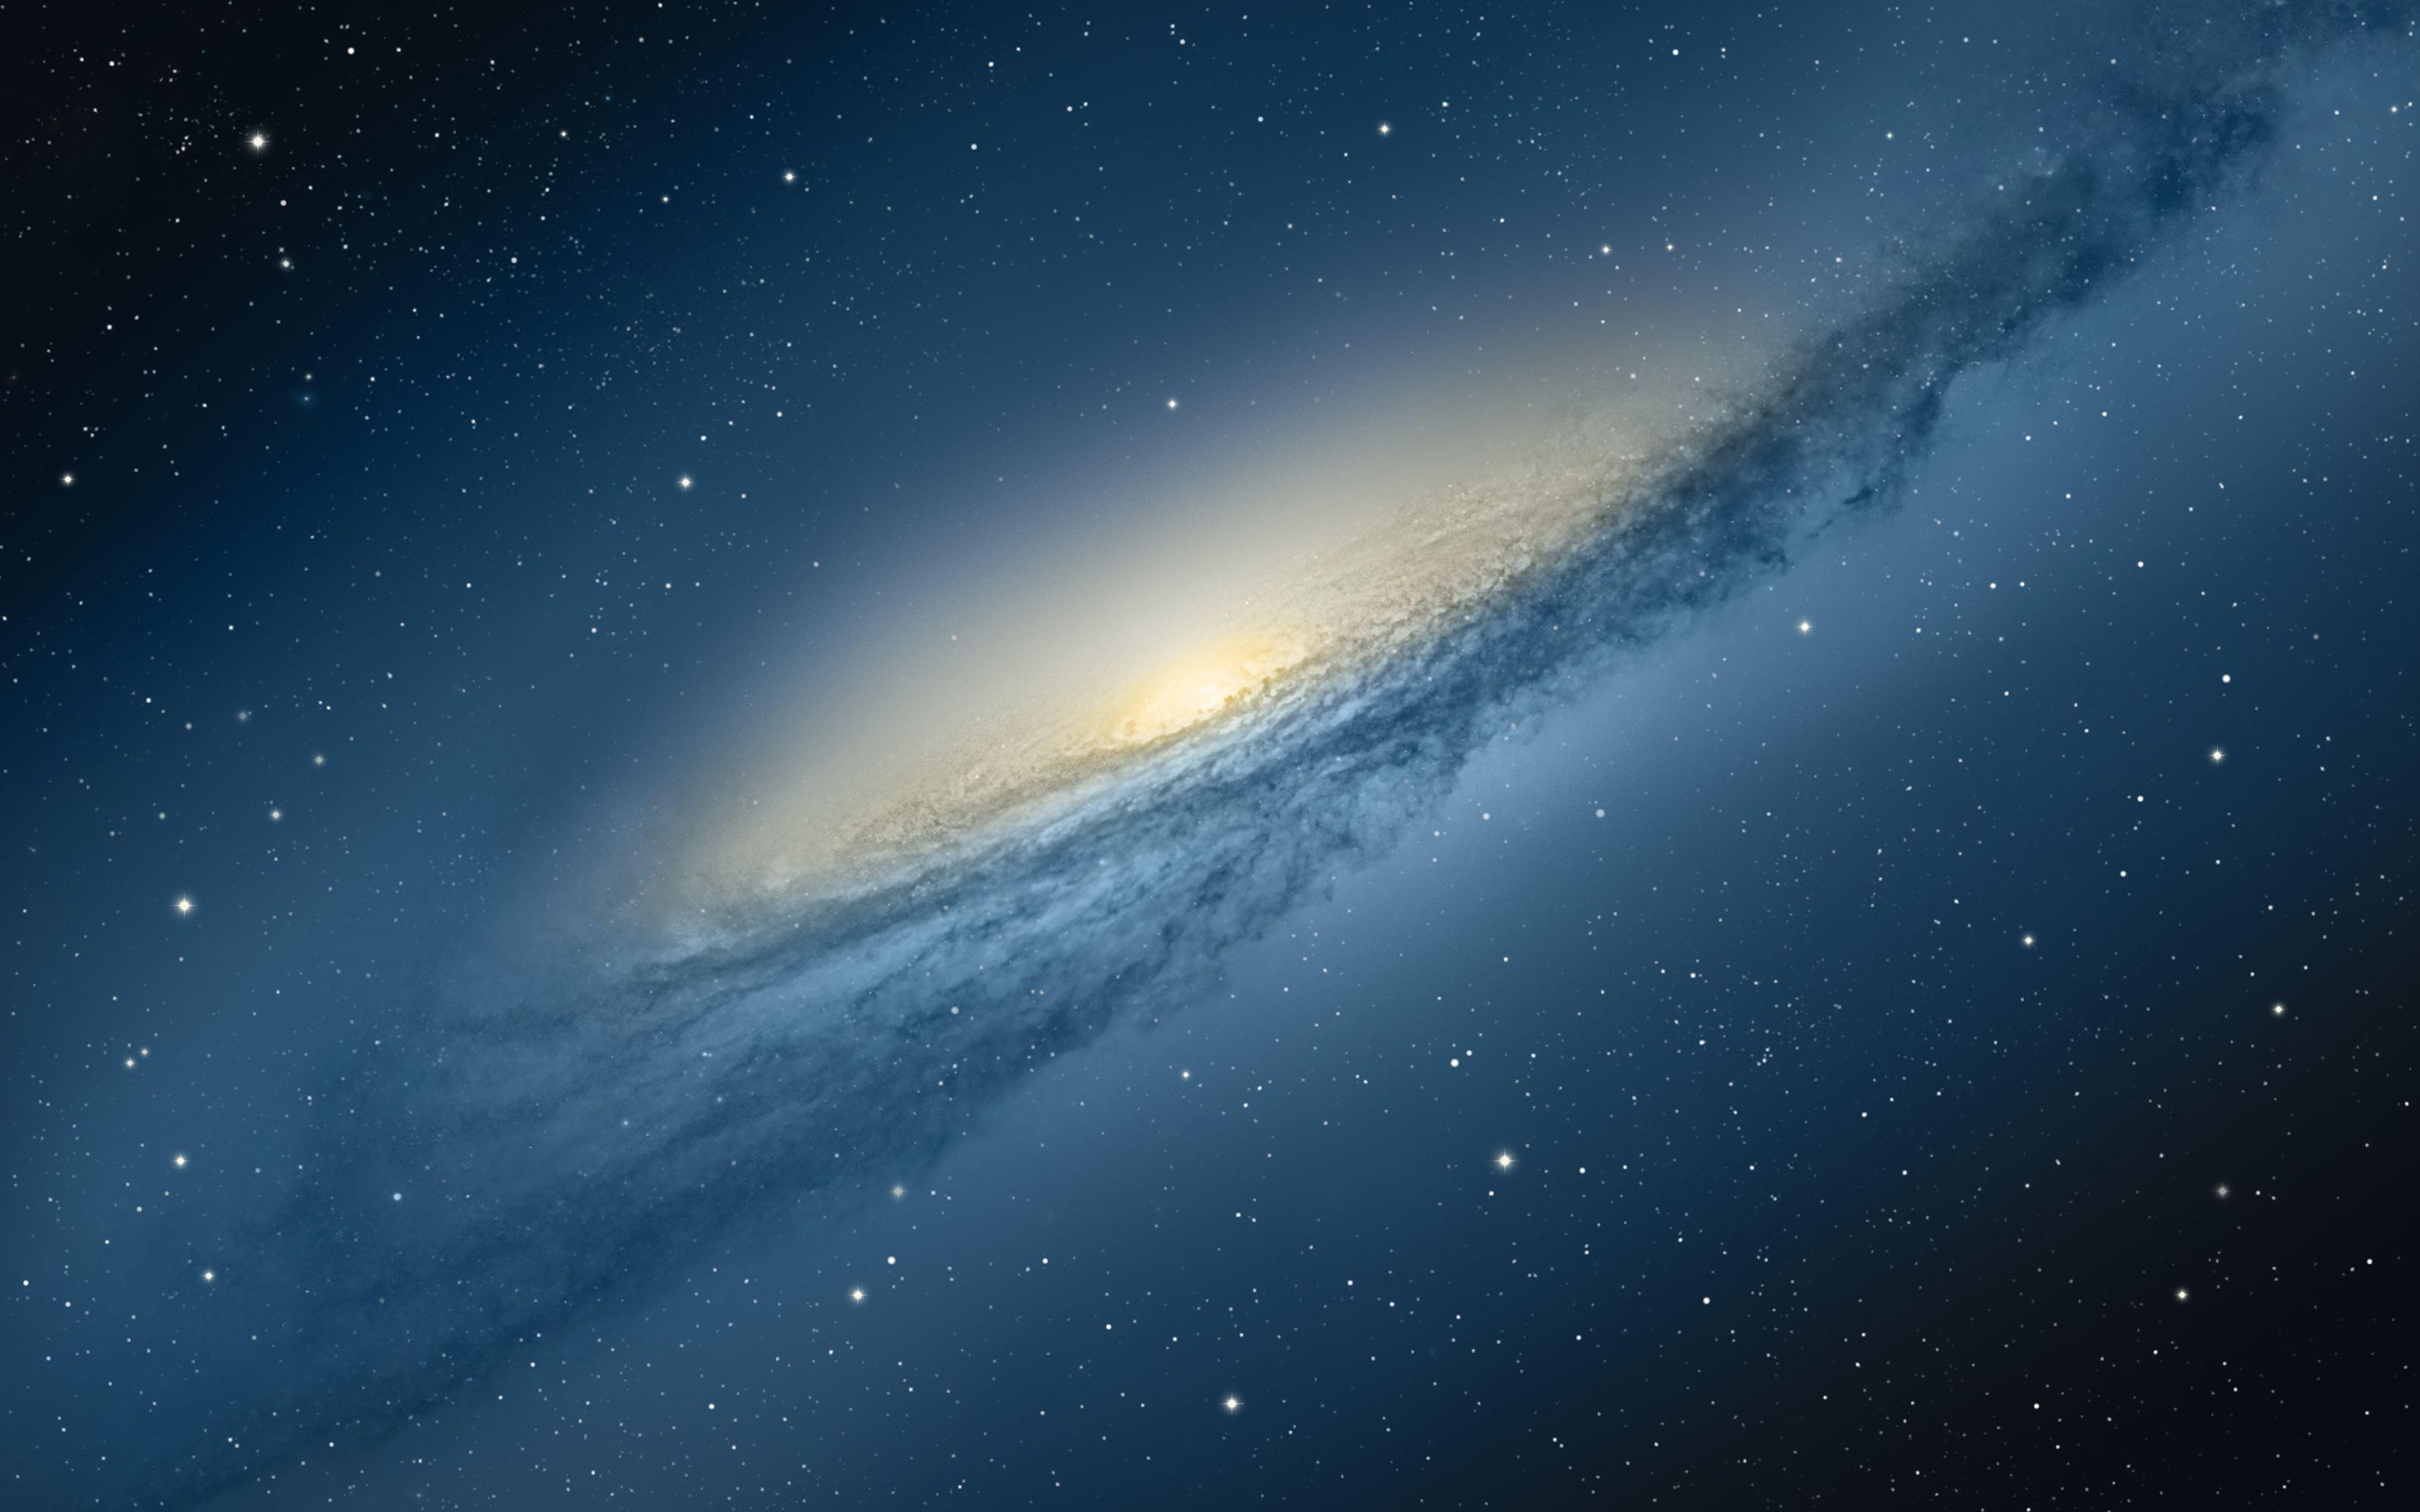 Space Galaxy Galaxy Wallpaper Mac Wallpaper Retina Wallpaper